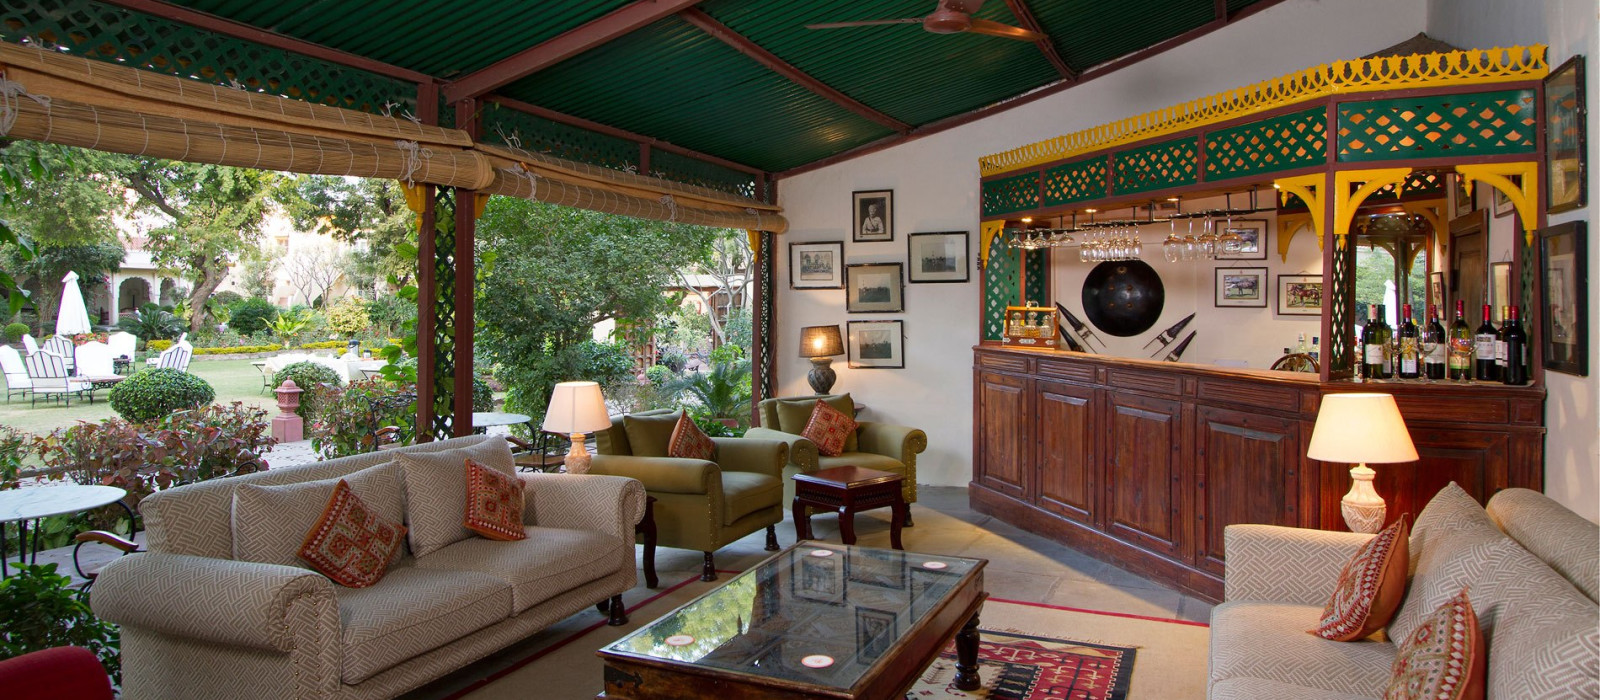 Hotel Rohet Garh Nordindien